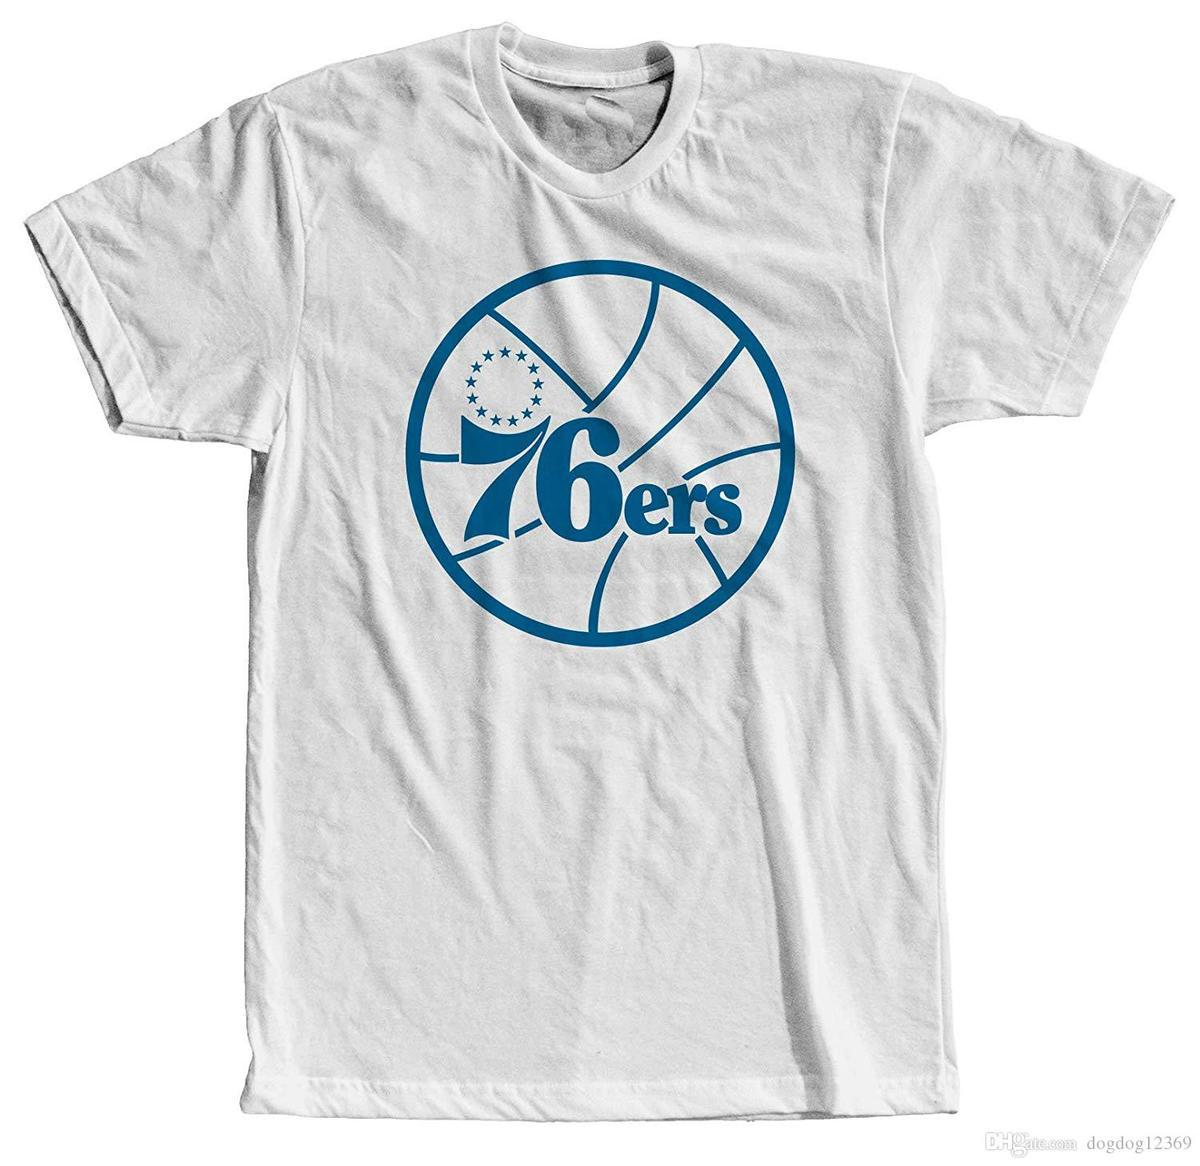 3c71b9853 Sac Apparel Basketballer Team Logo Sportser Tees Men Graphic Vinyl T Shirt  Graphic T Shirts Custom Shirt From Jie037, $14.67  DHgate.Com